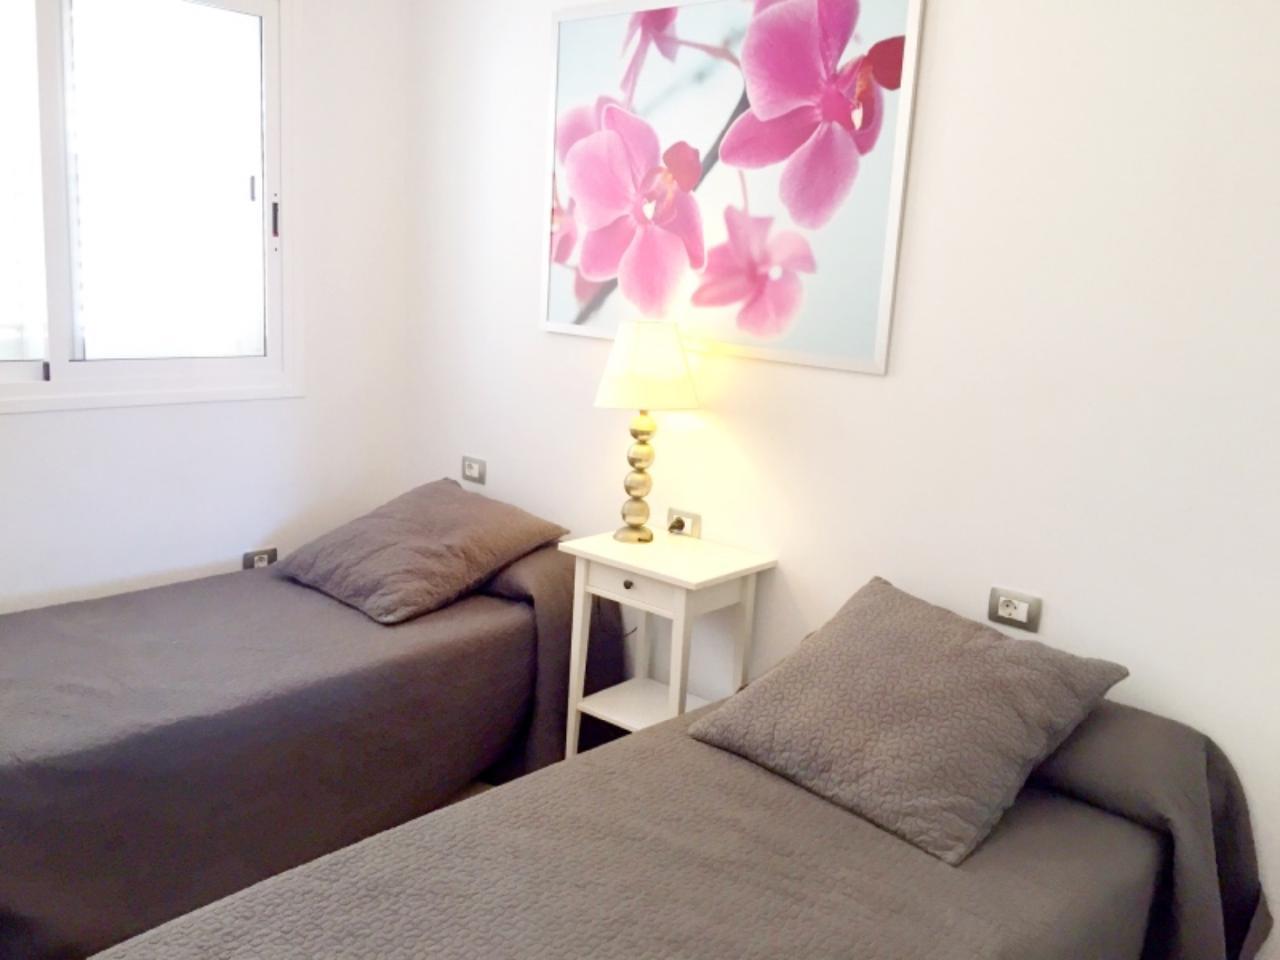 Appartement de vacances Apartment mit Meerblick, Satellitenfernsehen (2412056), Poris de Abona, Ténérife, Iles Canaries, Espagne, image 11